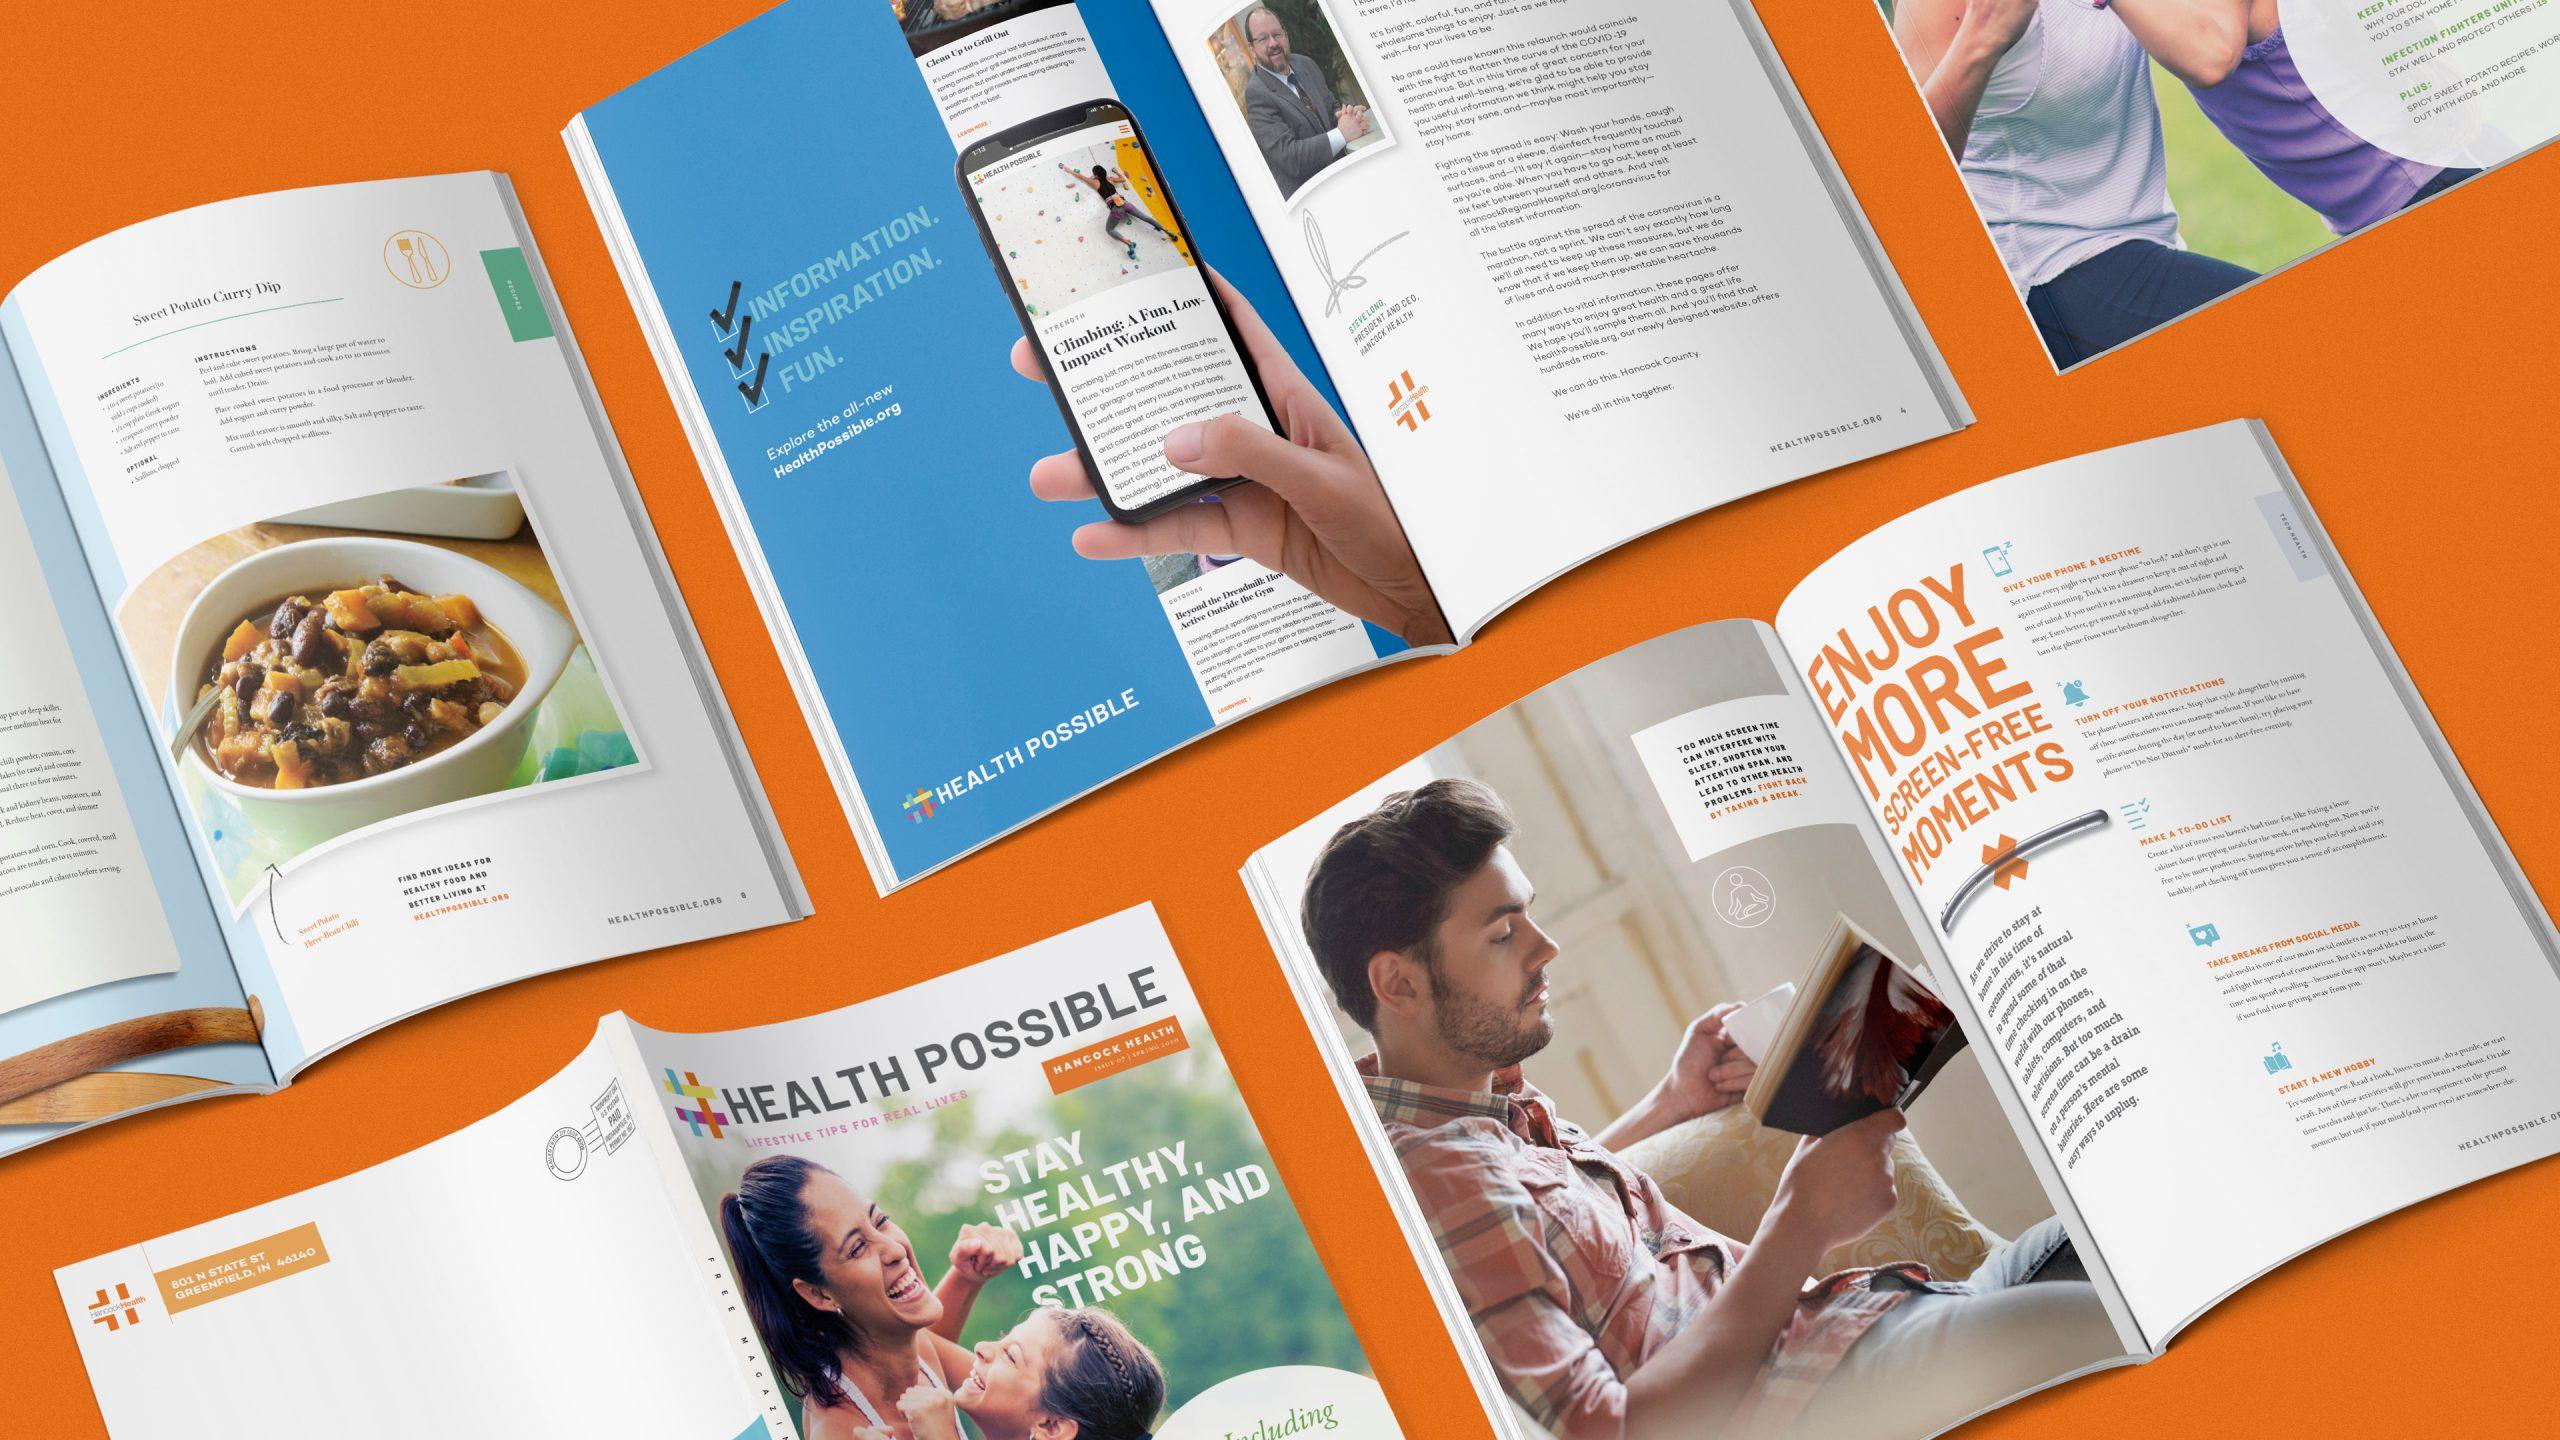 Health Possible Magazine